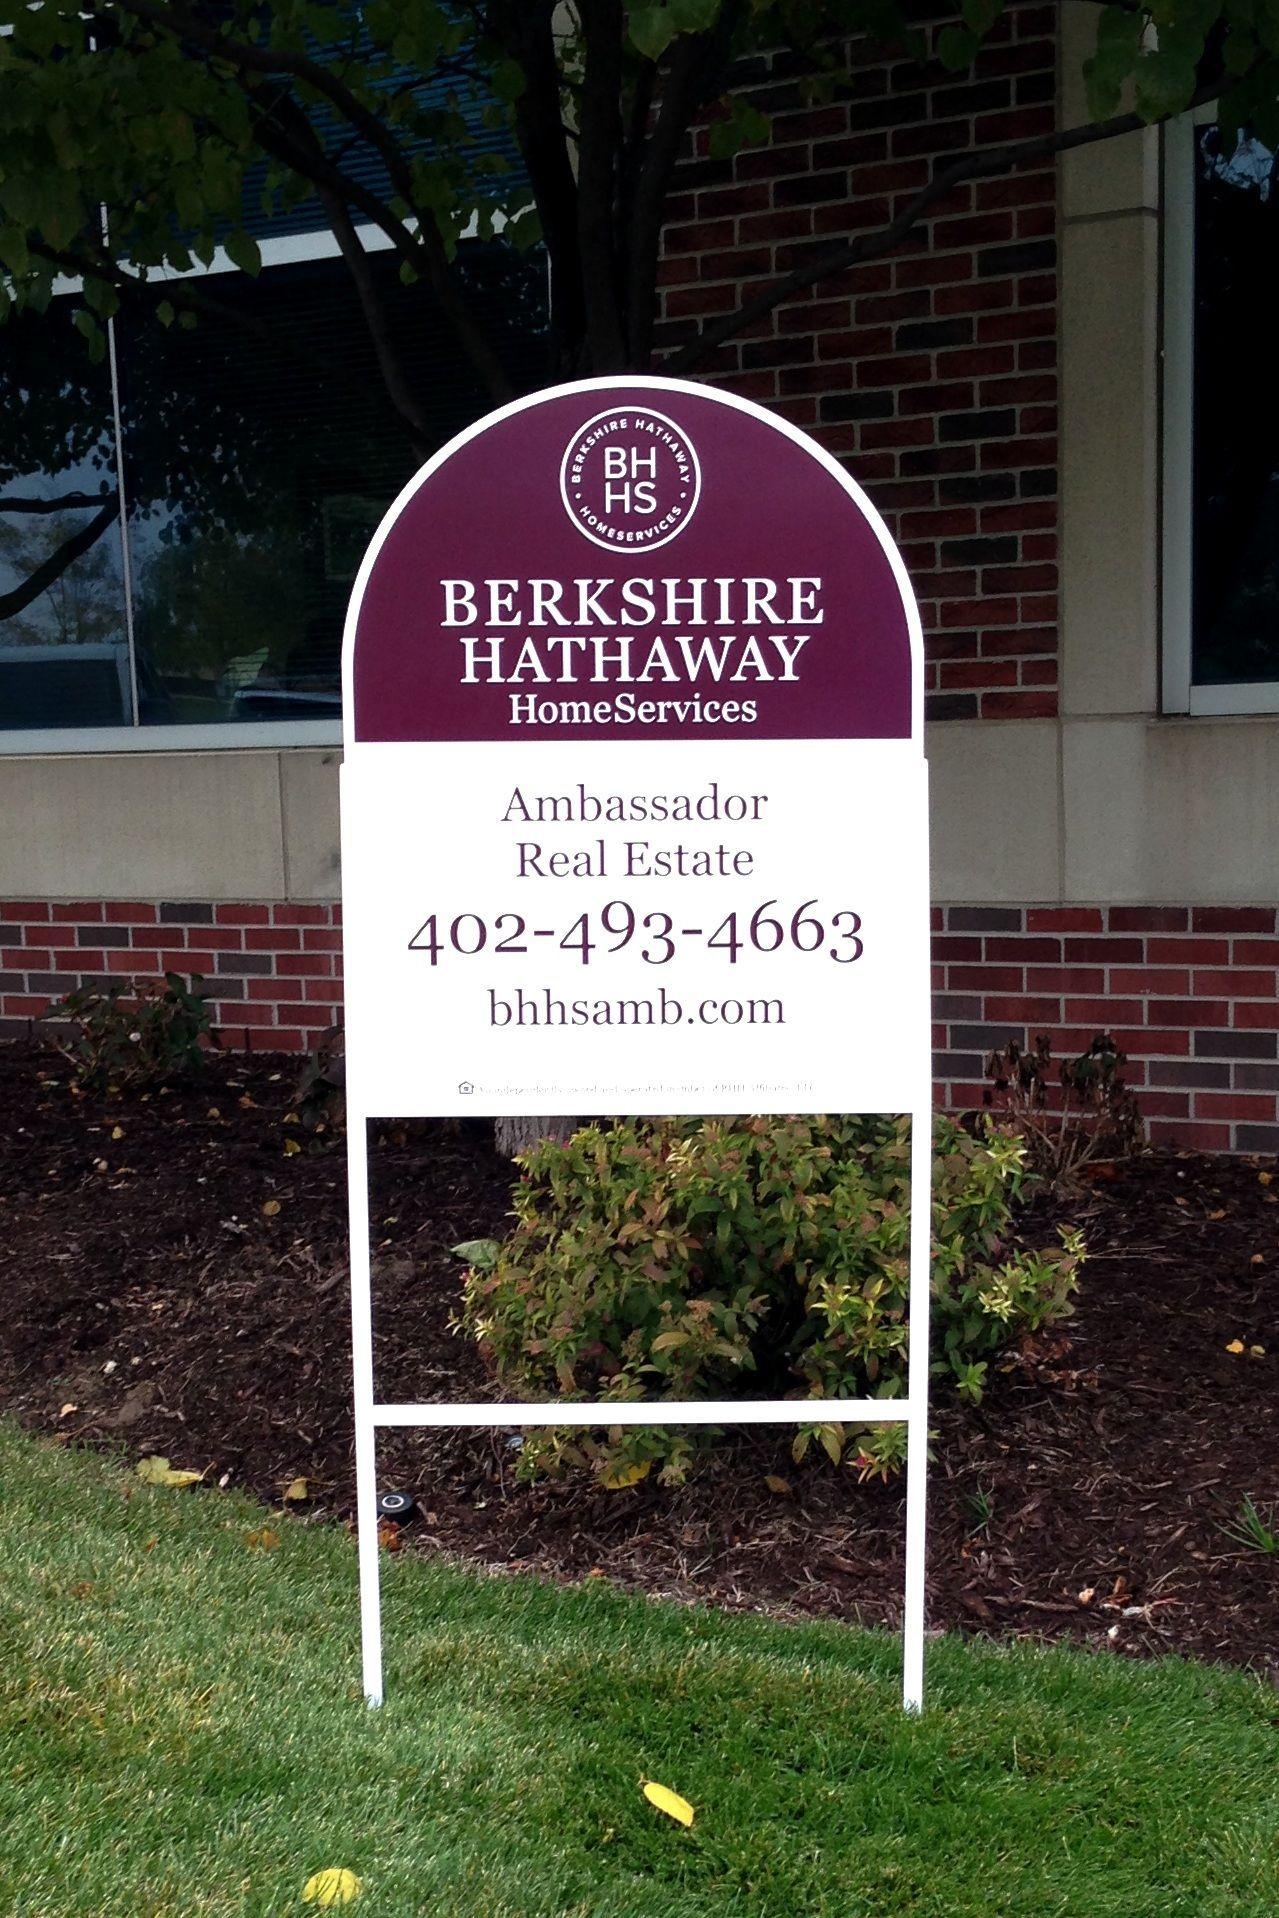 Berkshire Hathaway Homeservices Ambassador Real Estate Sign Inmobiliaria Propiedades